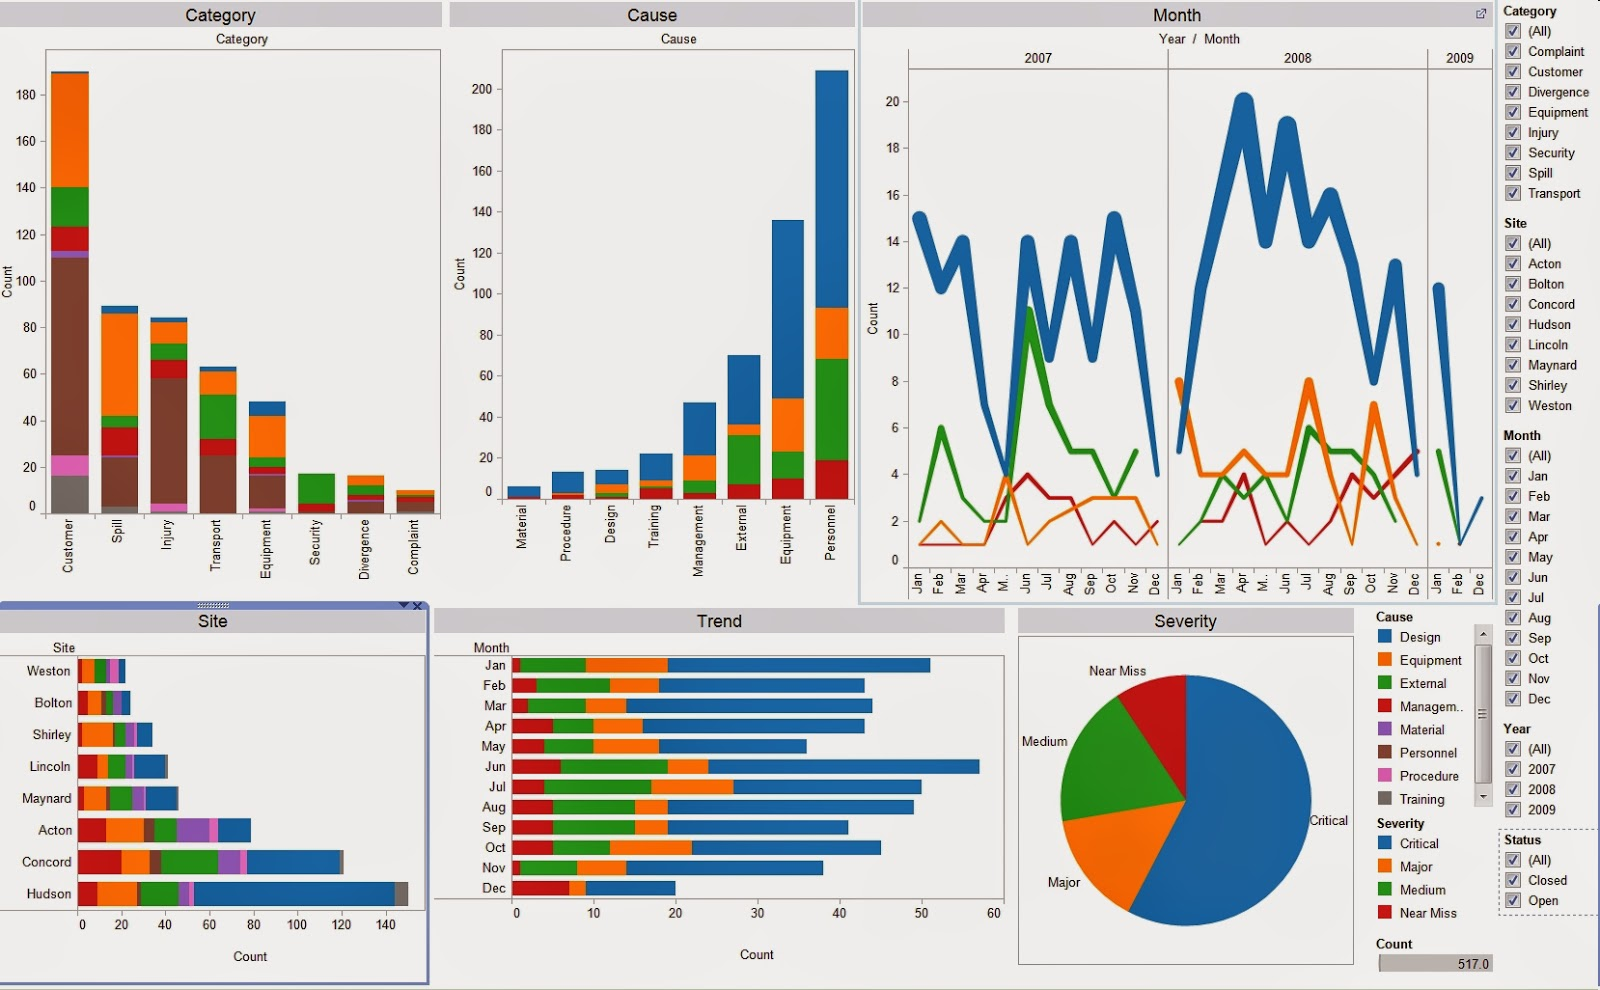 sql server architecture diagram with explanation plumbing rough in dimensions ravindranathreddy msbi blog bi tool comparisons